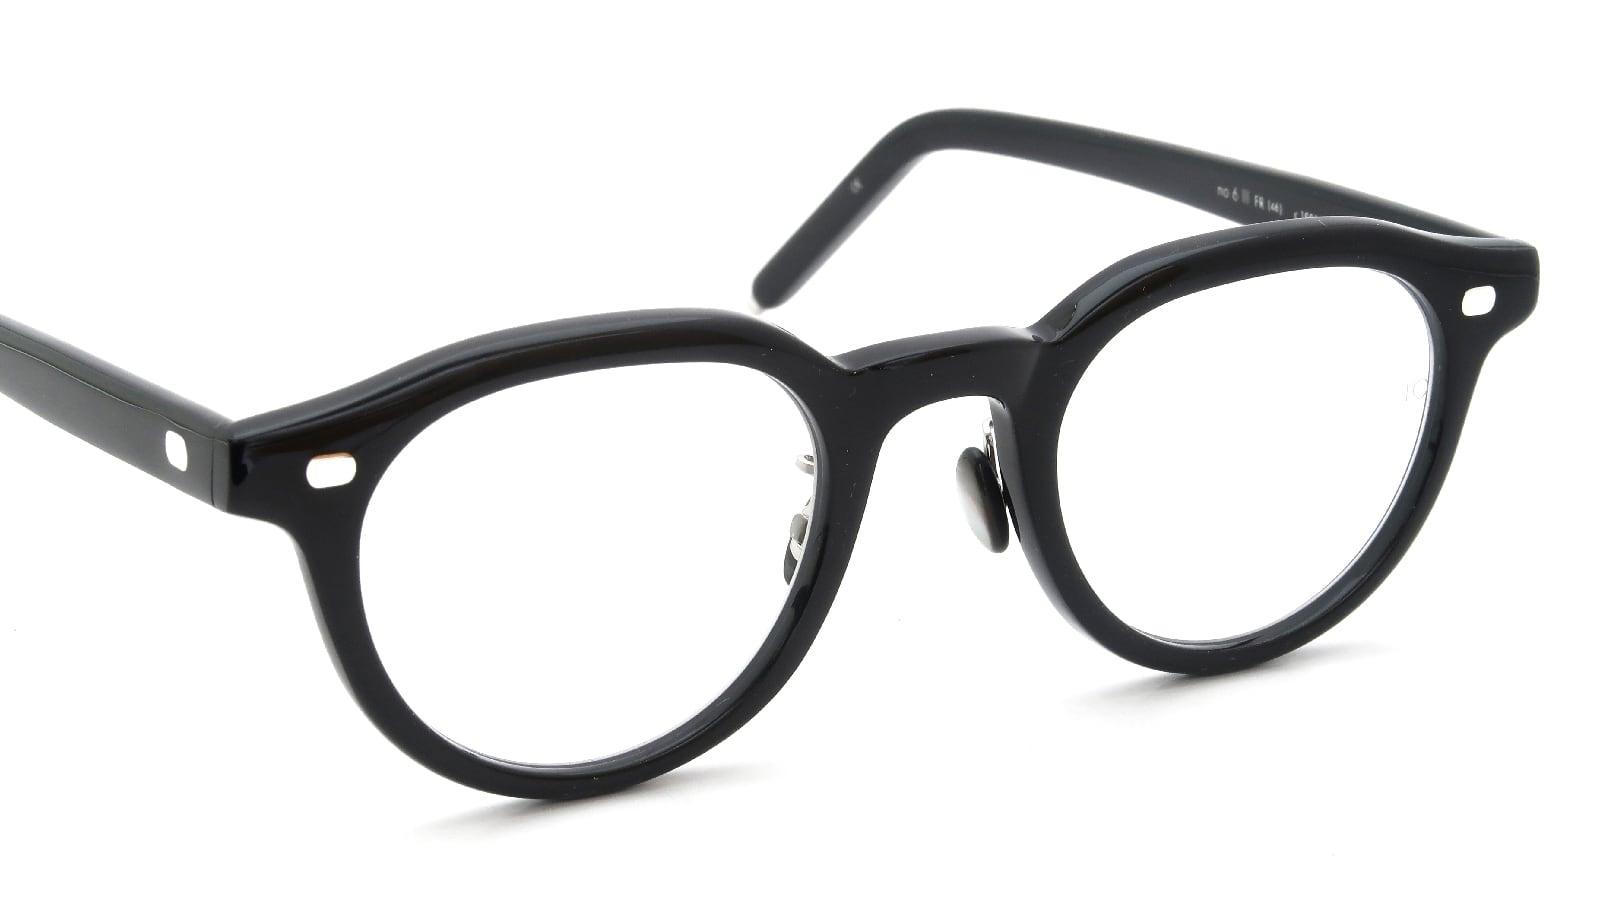 10 eyevan NO.6 Ⅲ FR 46size c.1002S Black 6